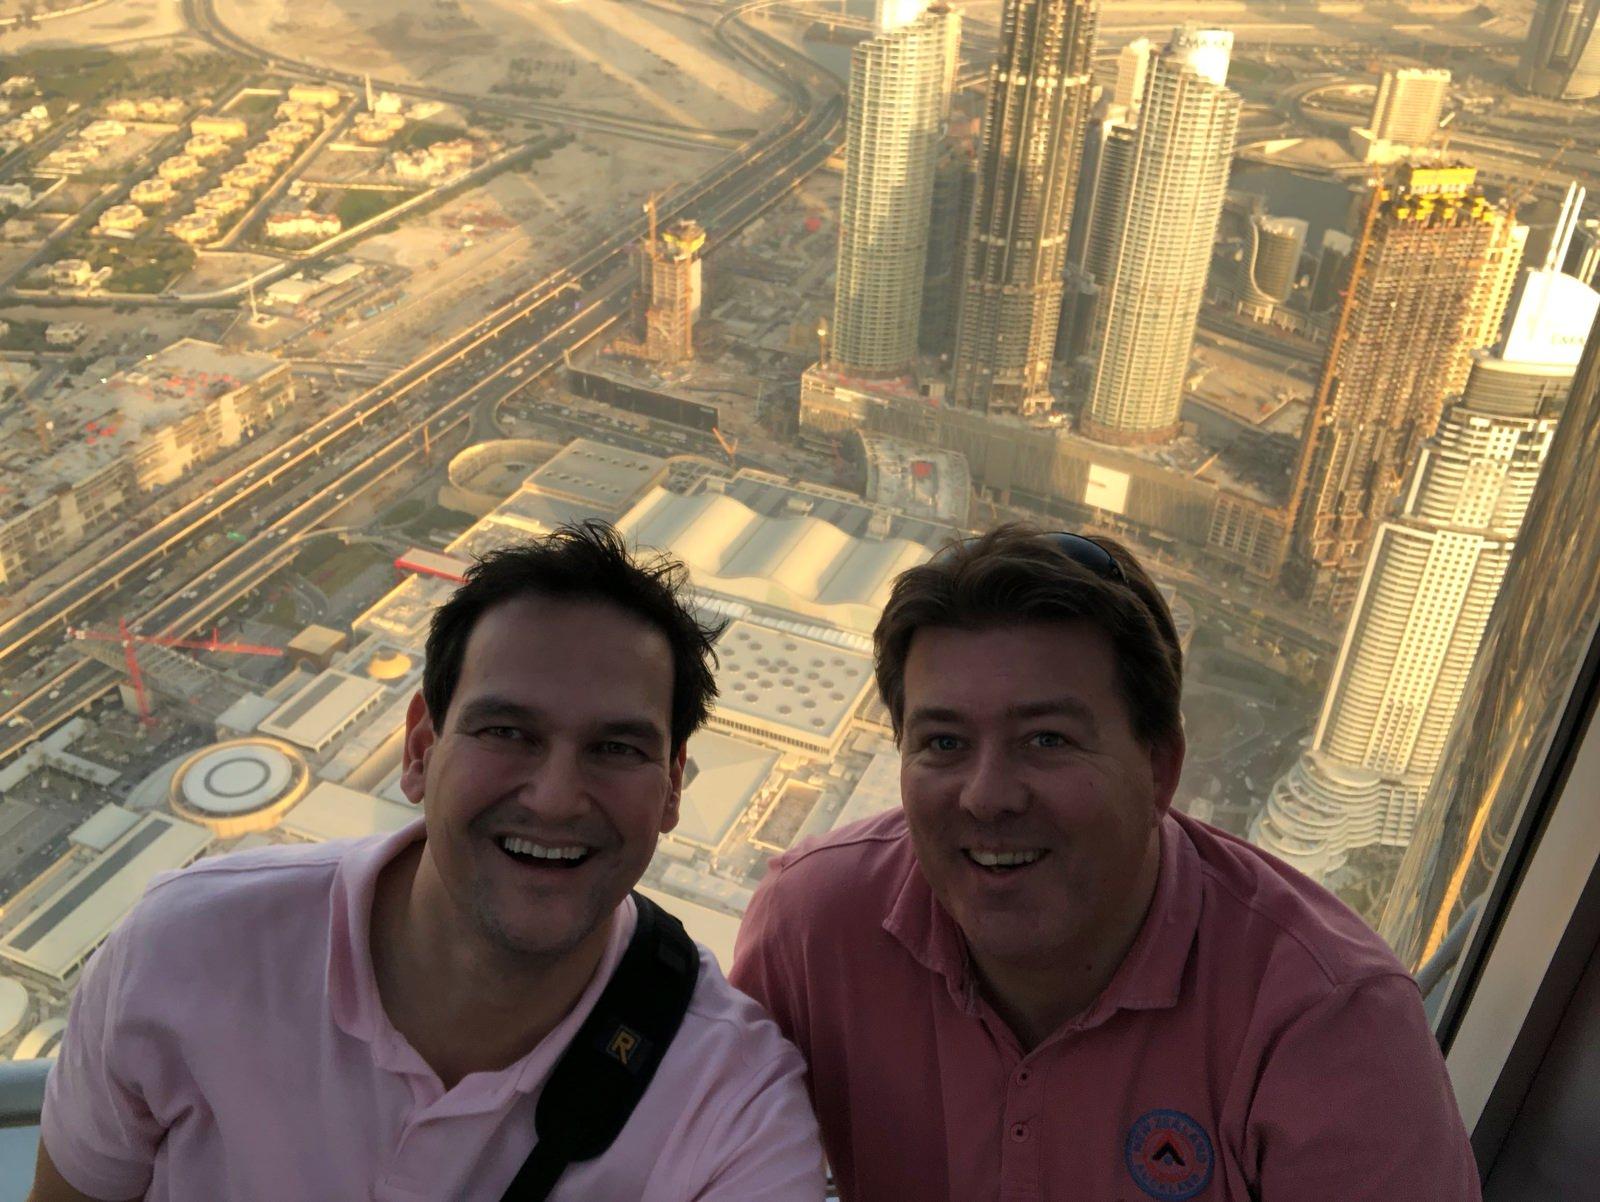 trouwshoot-bruidsfotografie-loveshoot-Dubai-Burj Kalifa3.jpg